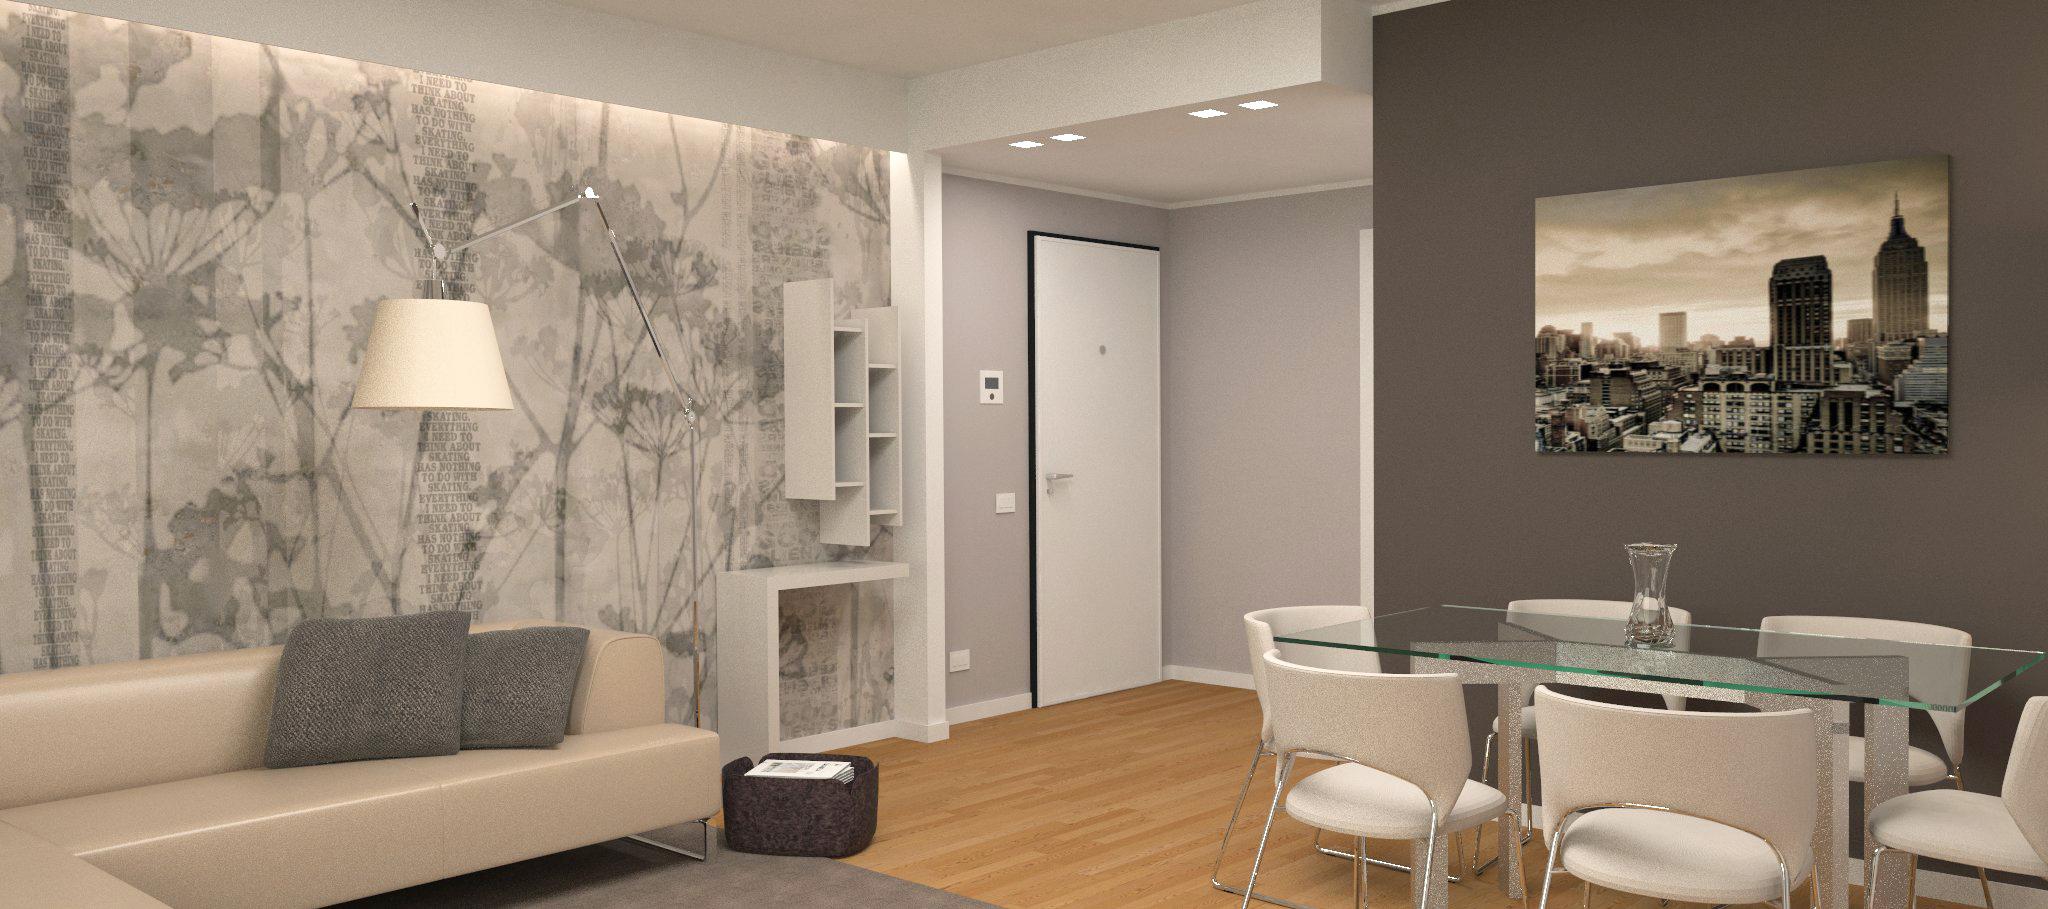 interesting vista ingresso ok with interior design milano